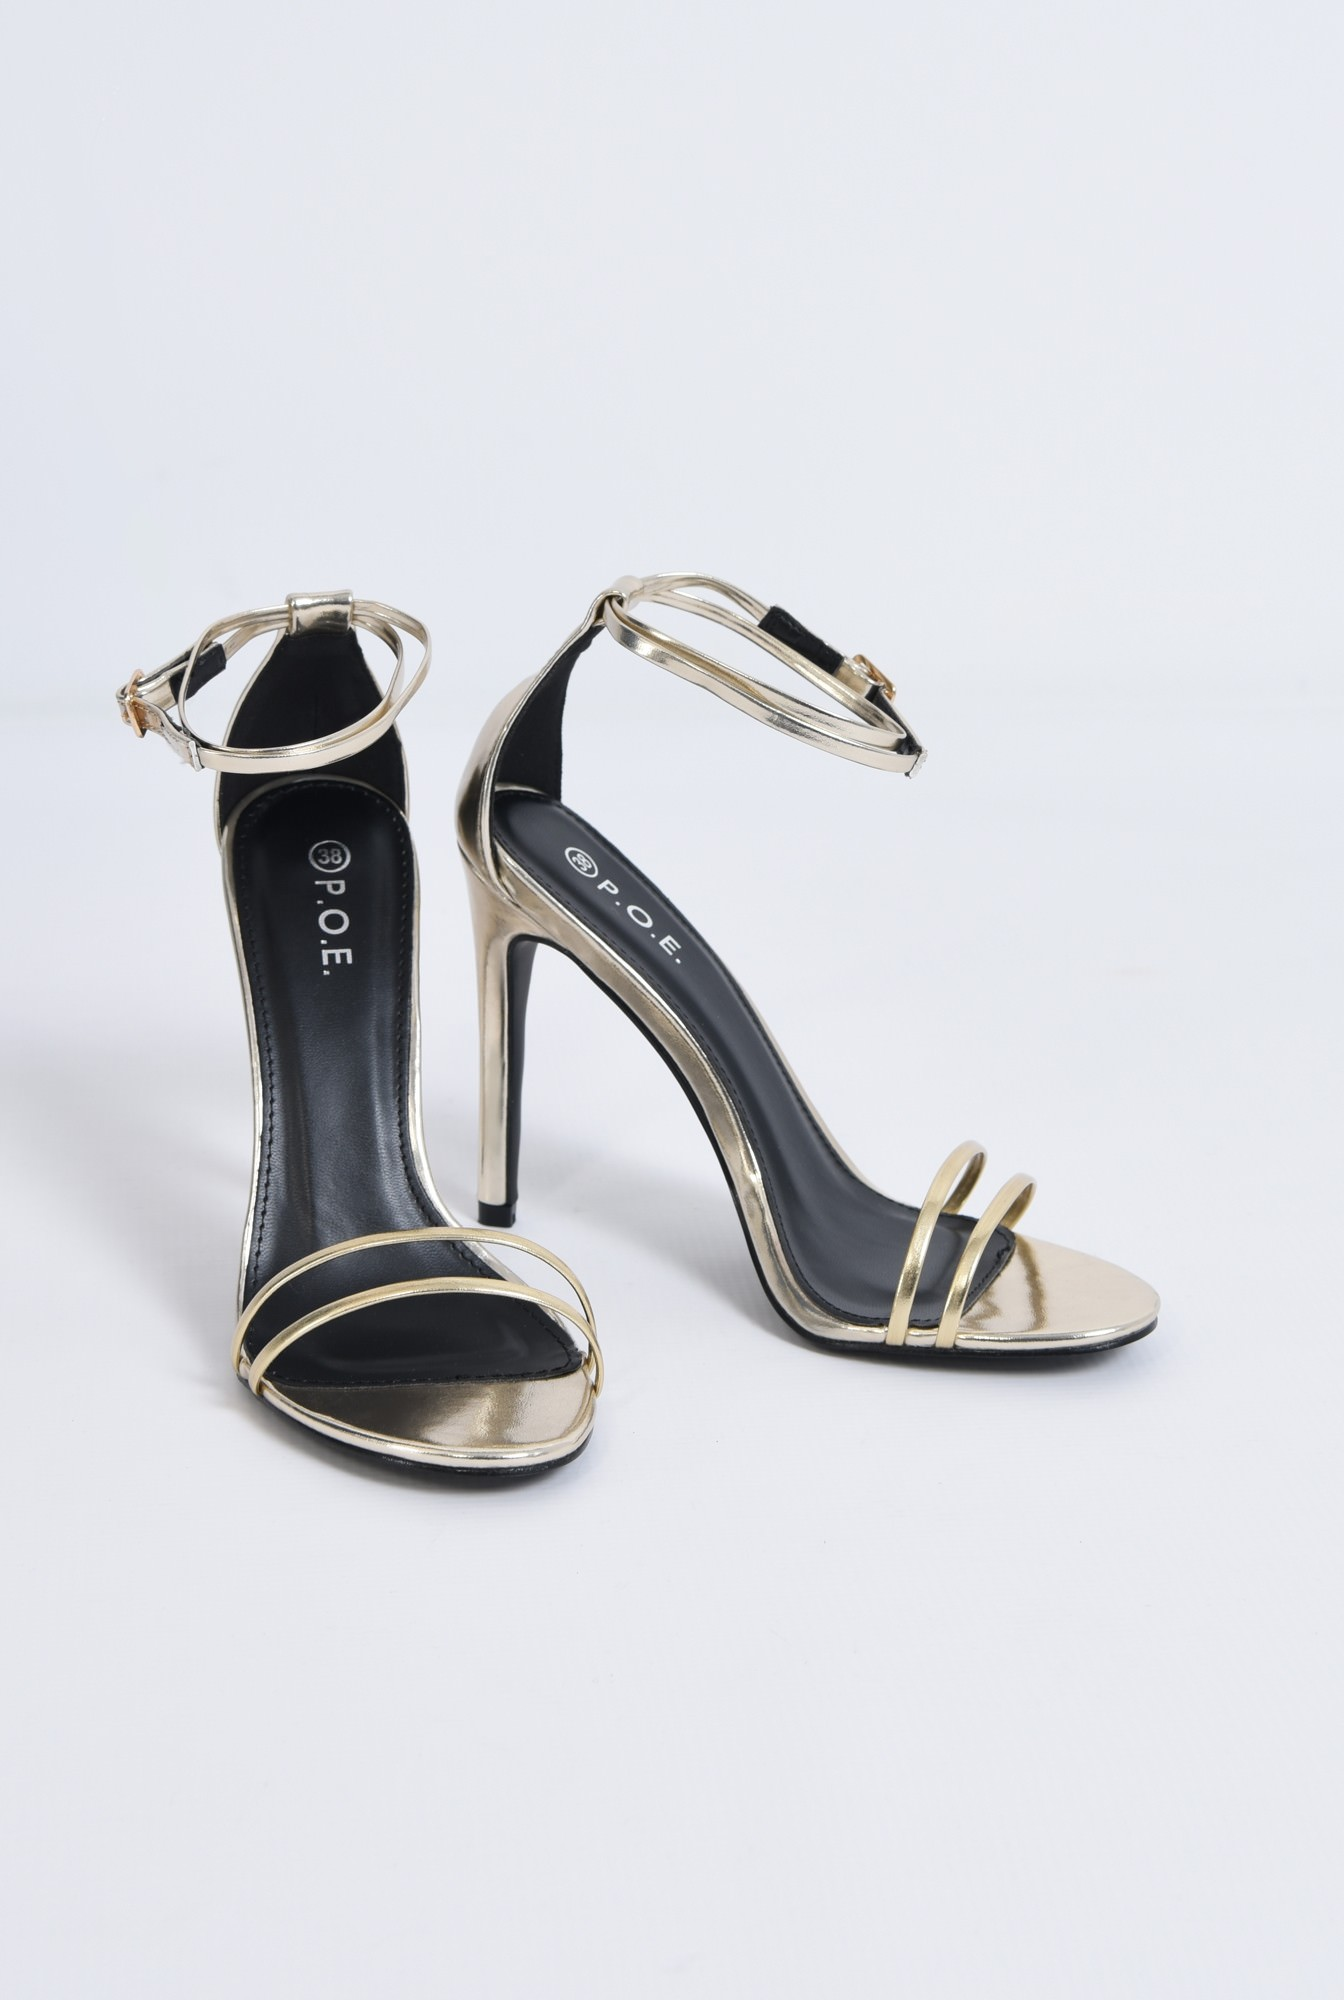 3 - sandale elegante, aurii, stiletto